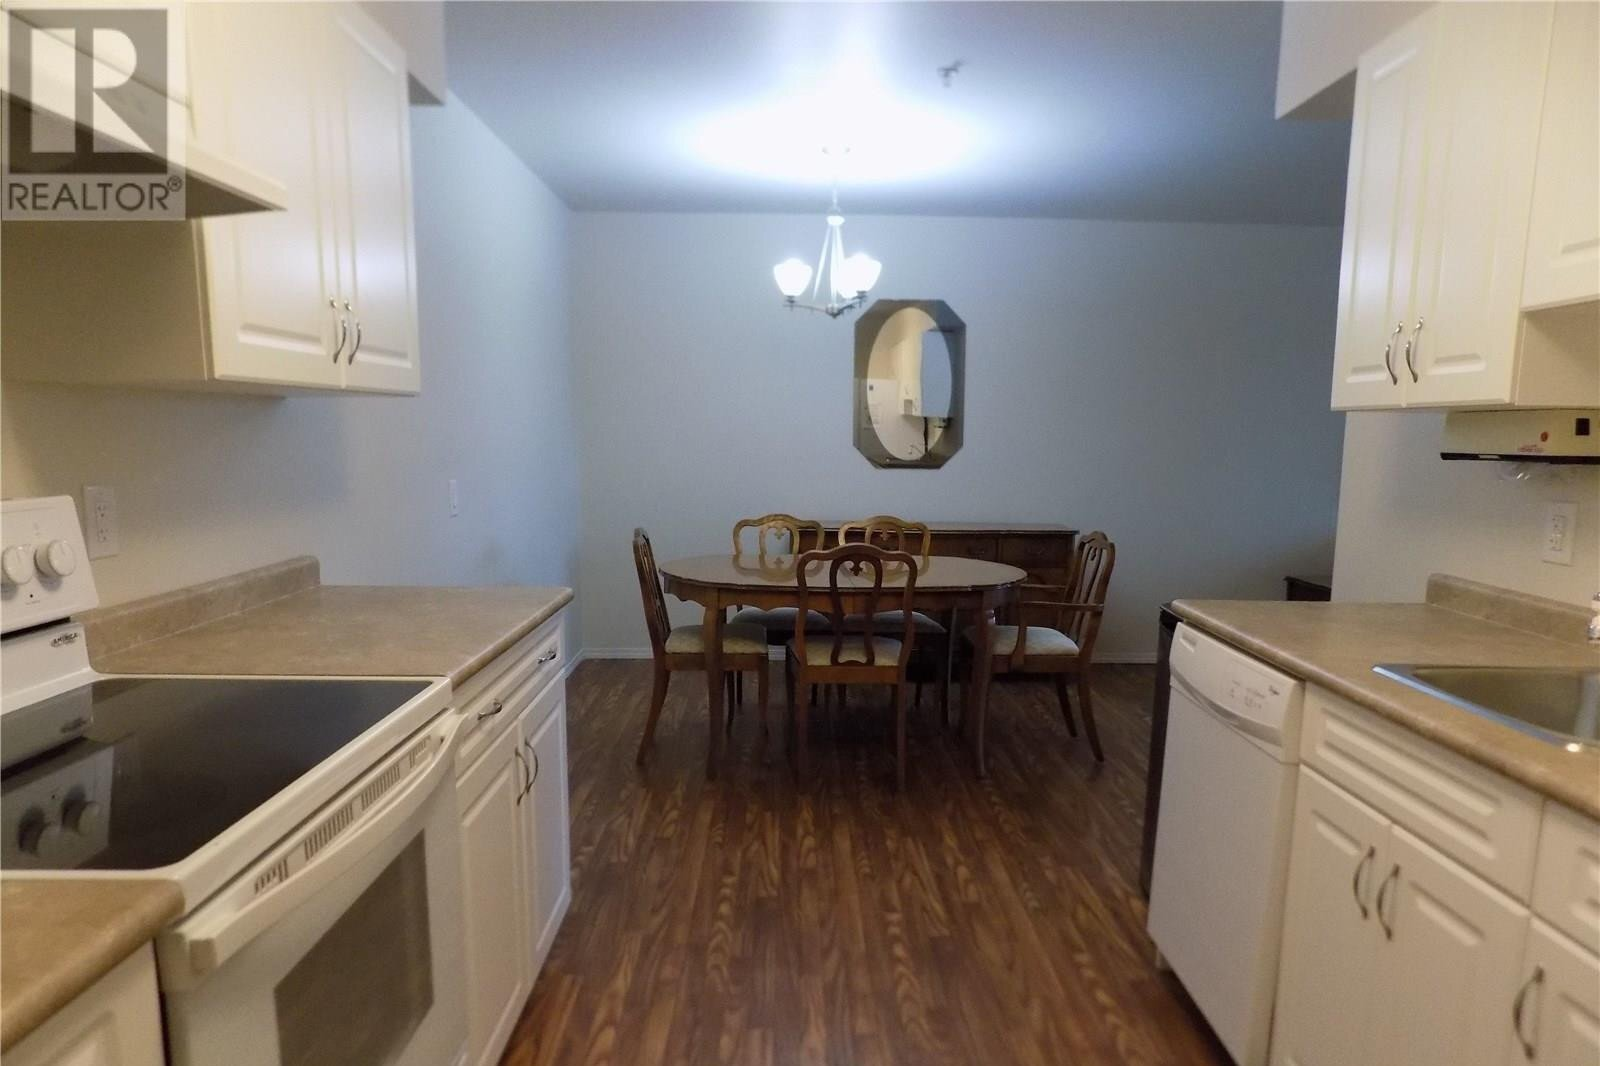 Condo for sale at 1802 106th St Unit 217 North Battleford Saskatchewan - MLS: SK833318